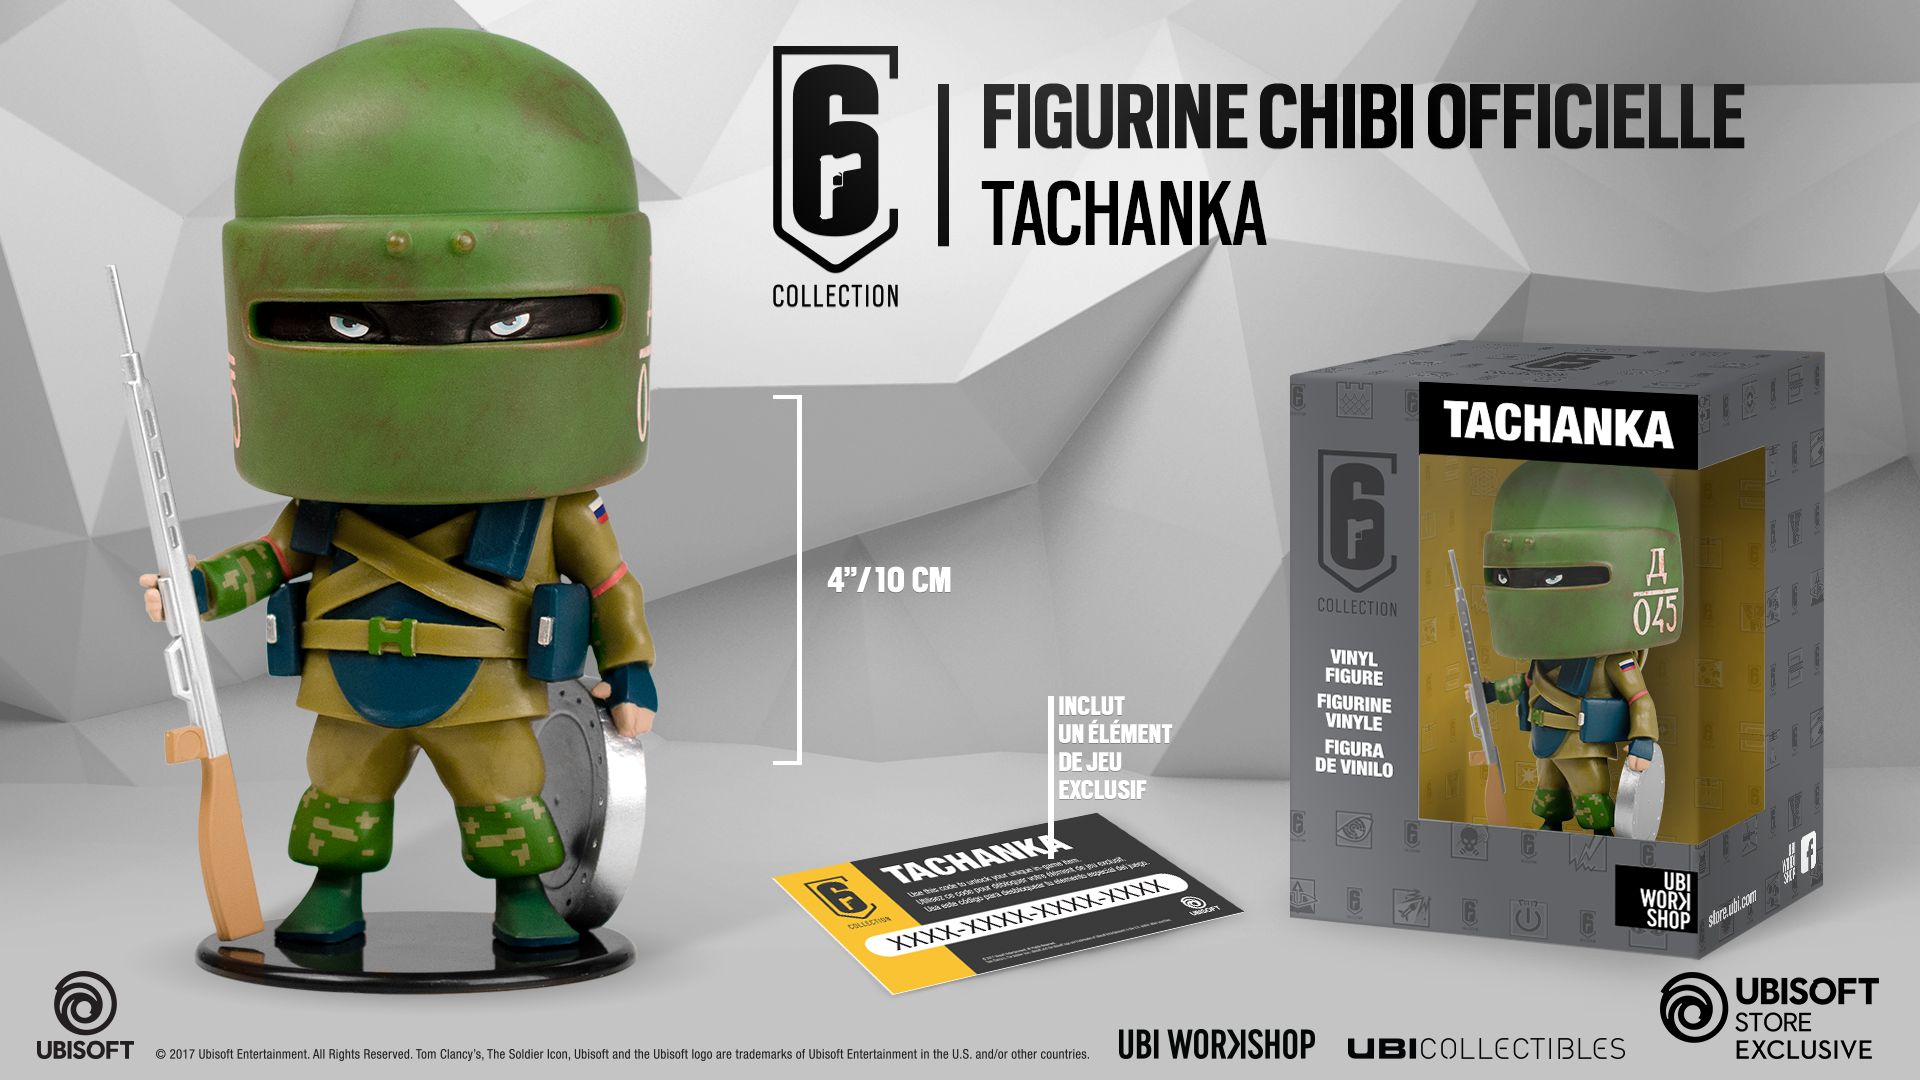 TACHANKA FIGURINE CHIBI SIX COLLECTION SERIE 1 UBI-COLLECTIBLES | Kingdom  Figurine